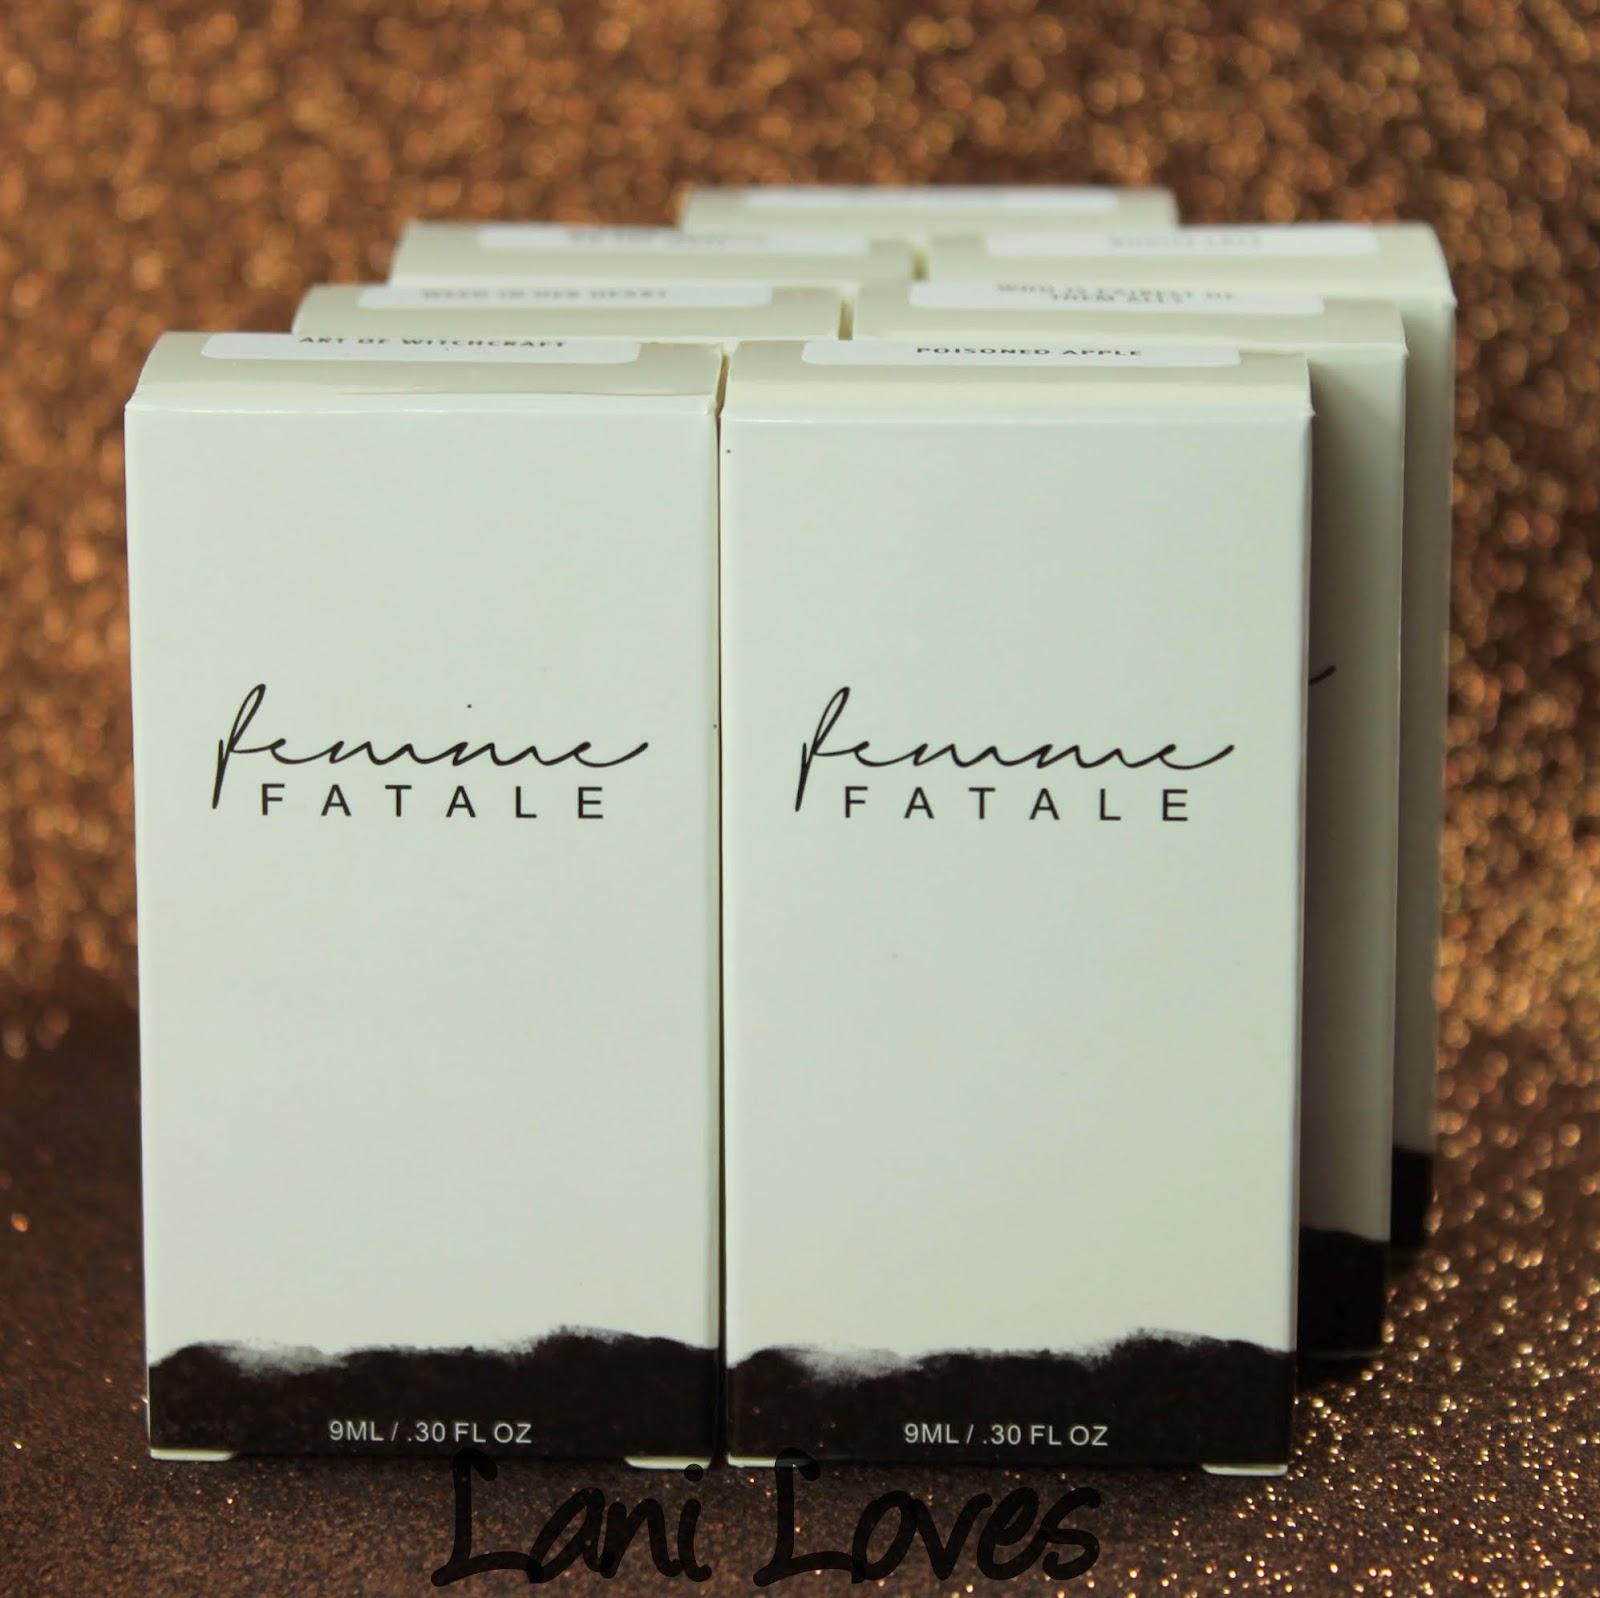 Femme Fatale Cosmetics April Presale Nail Polish Swatches & Review